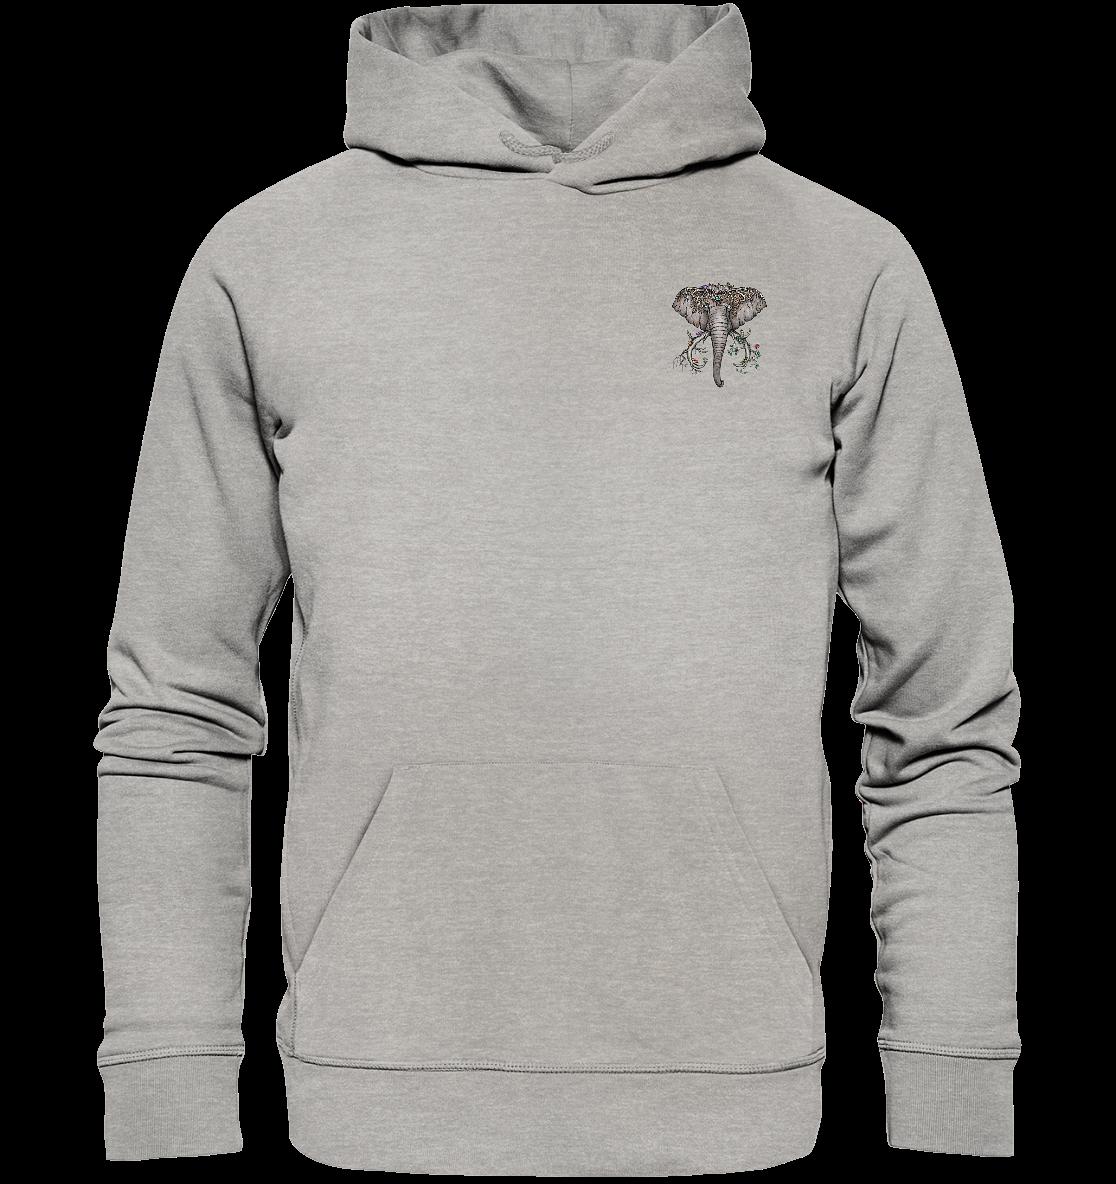 front-organic-hoodie-c2c1c0-1116x-1.png